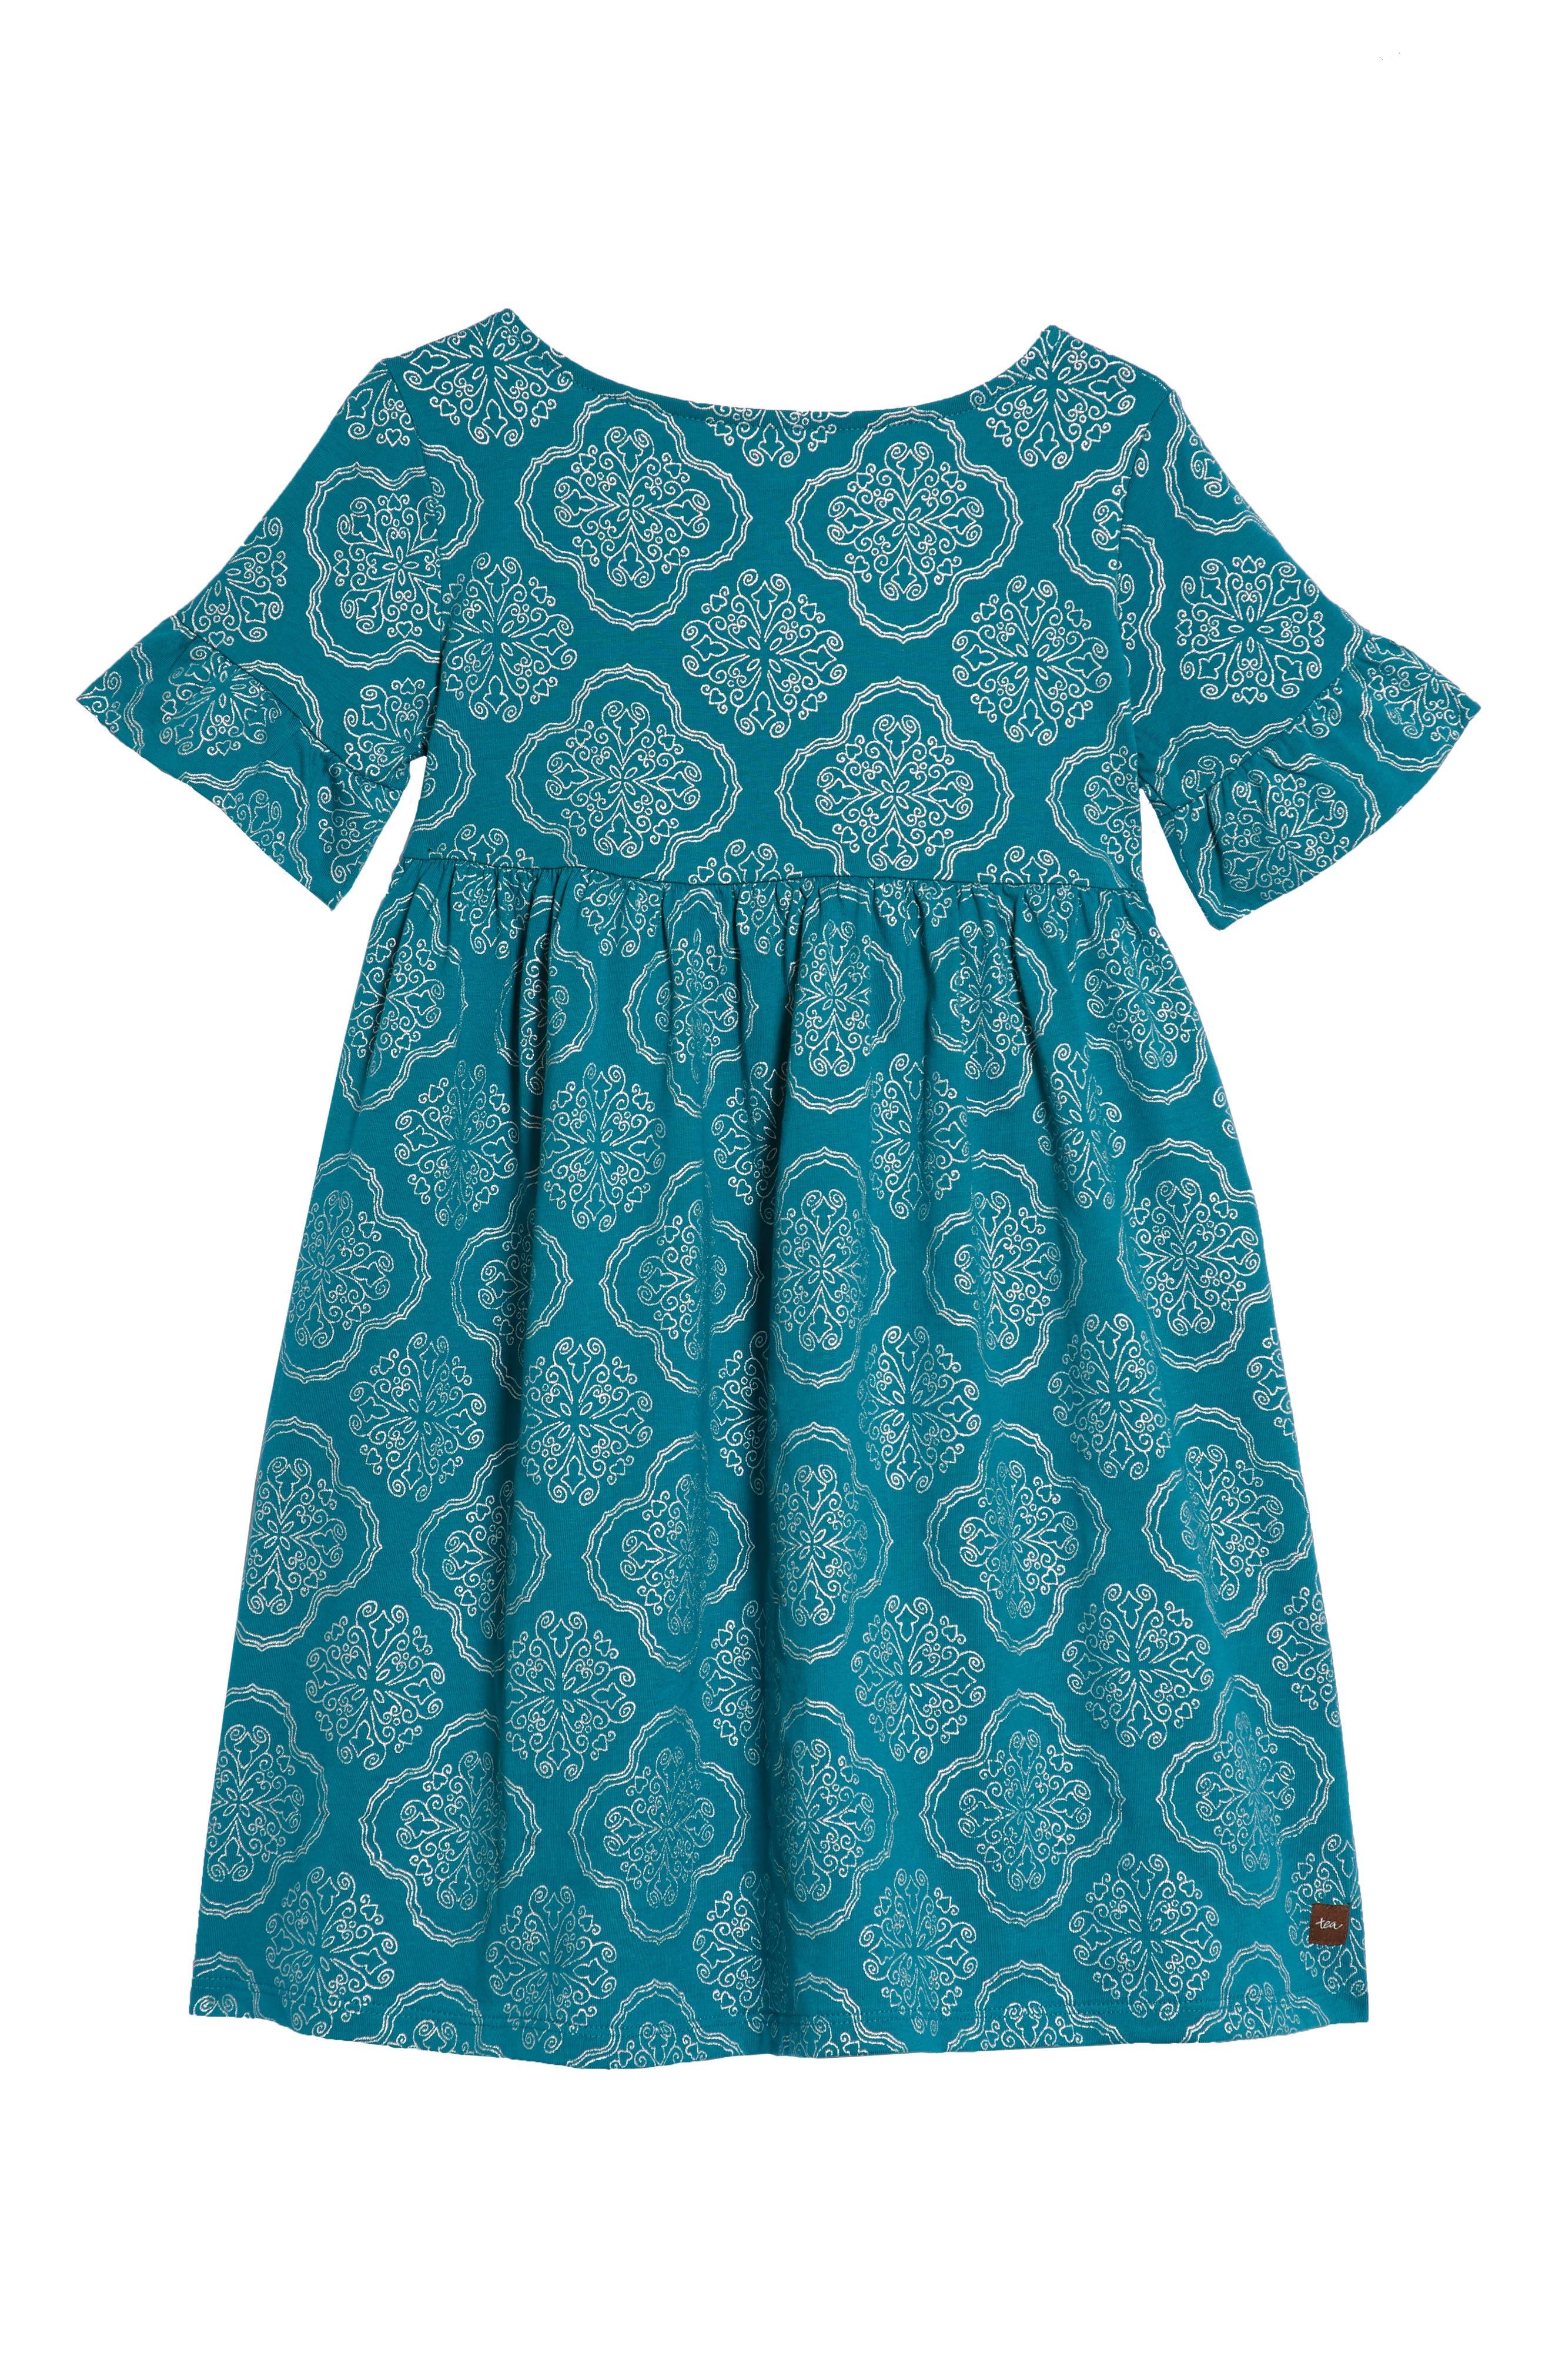 Ruffle Sleeve Dress,                             Alternate thumbnail 2, color,